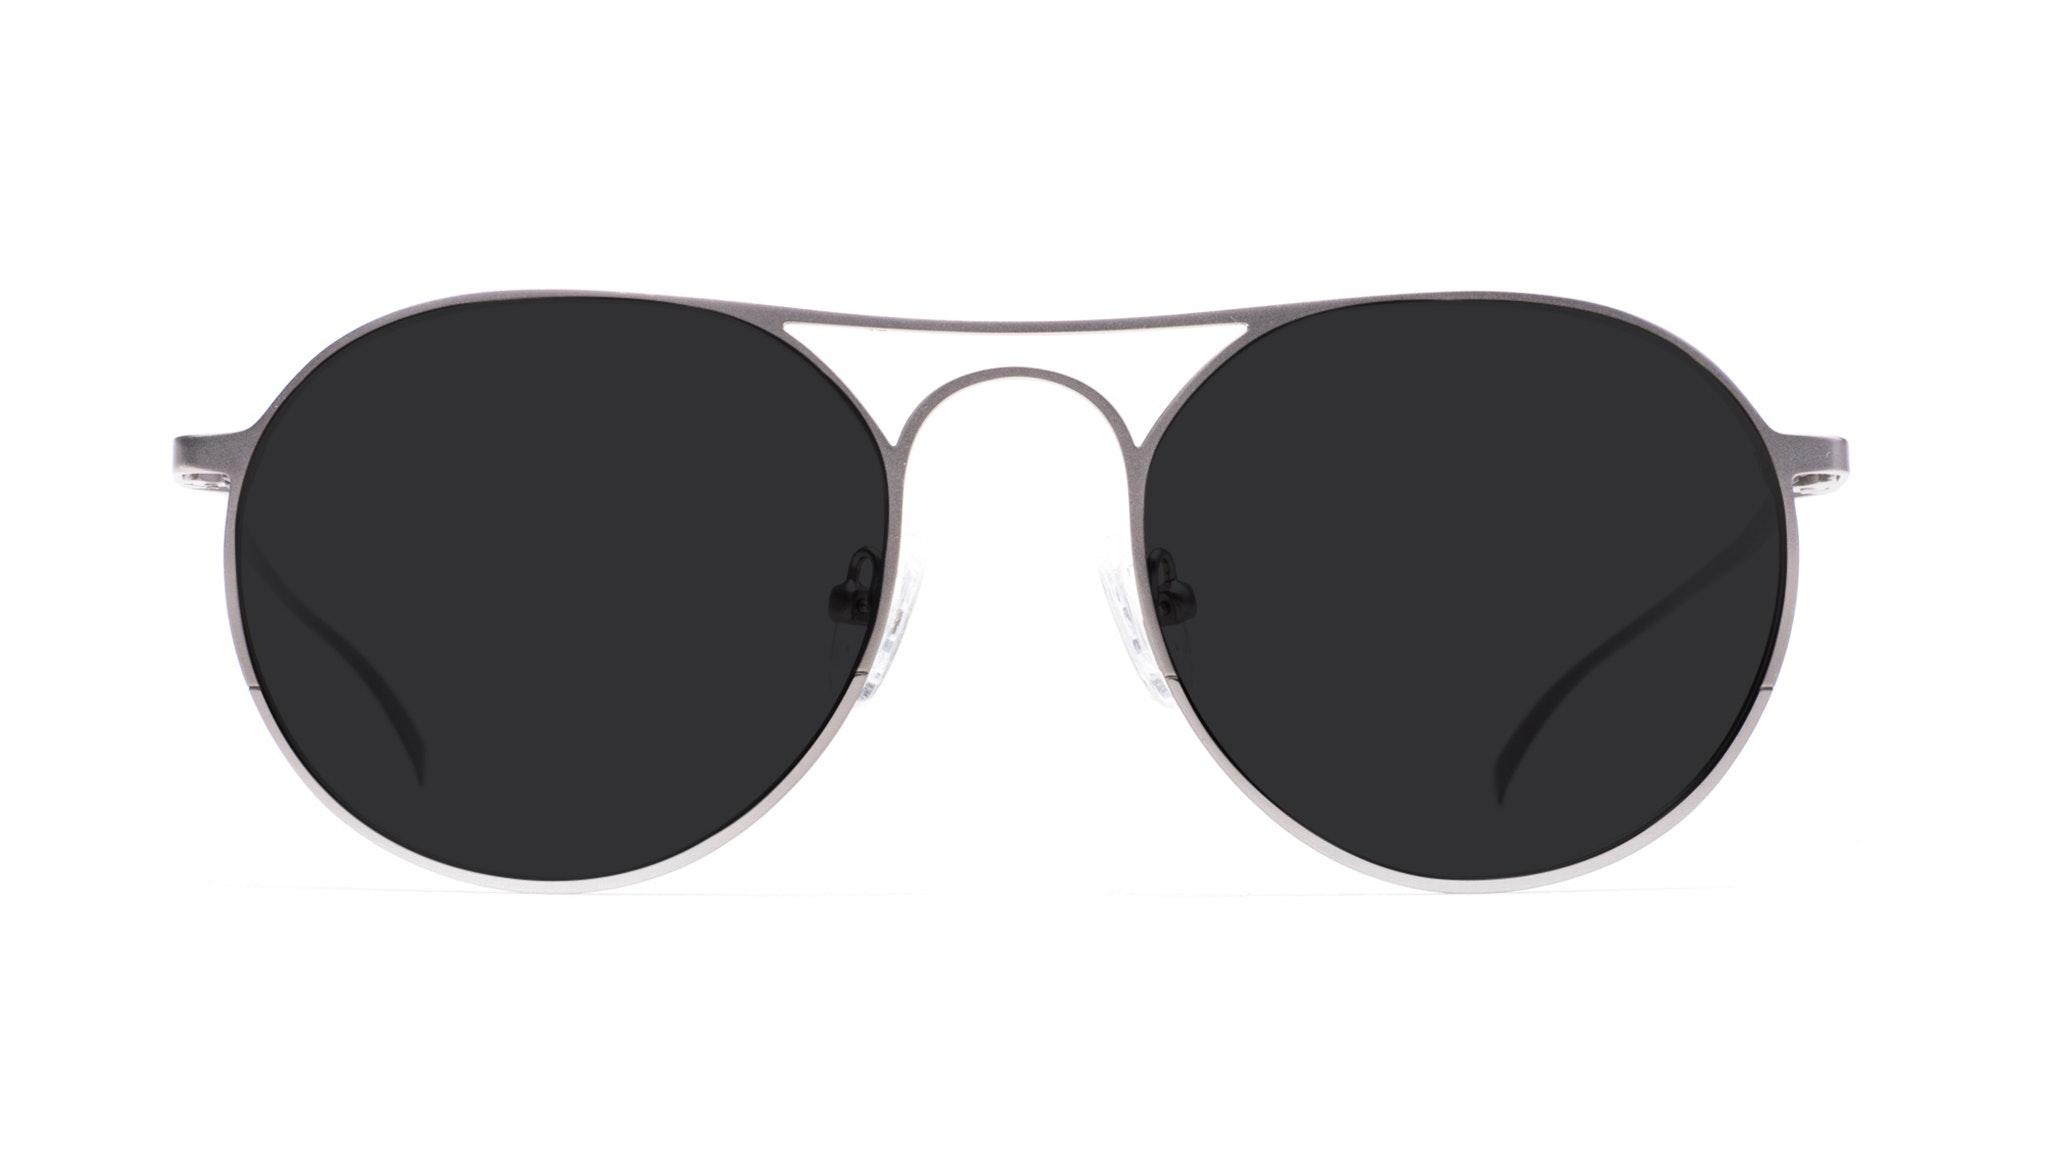 Affordable Fashion Glasses Aviator Round Sunglasses Men Contour Silver